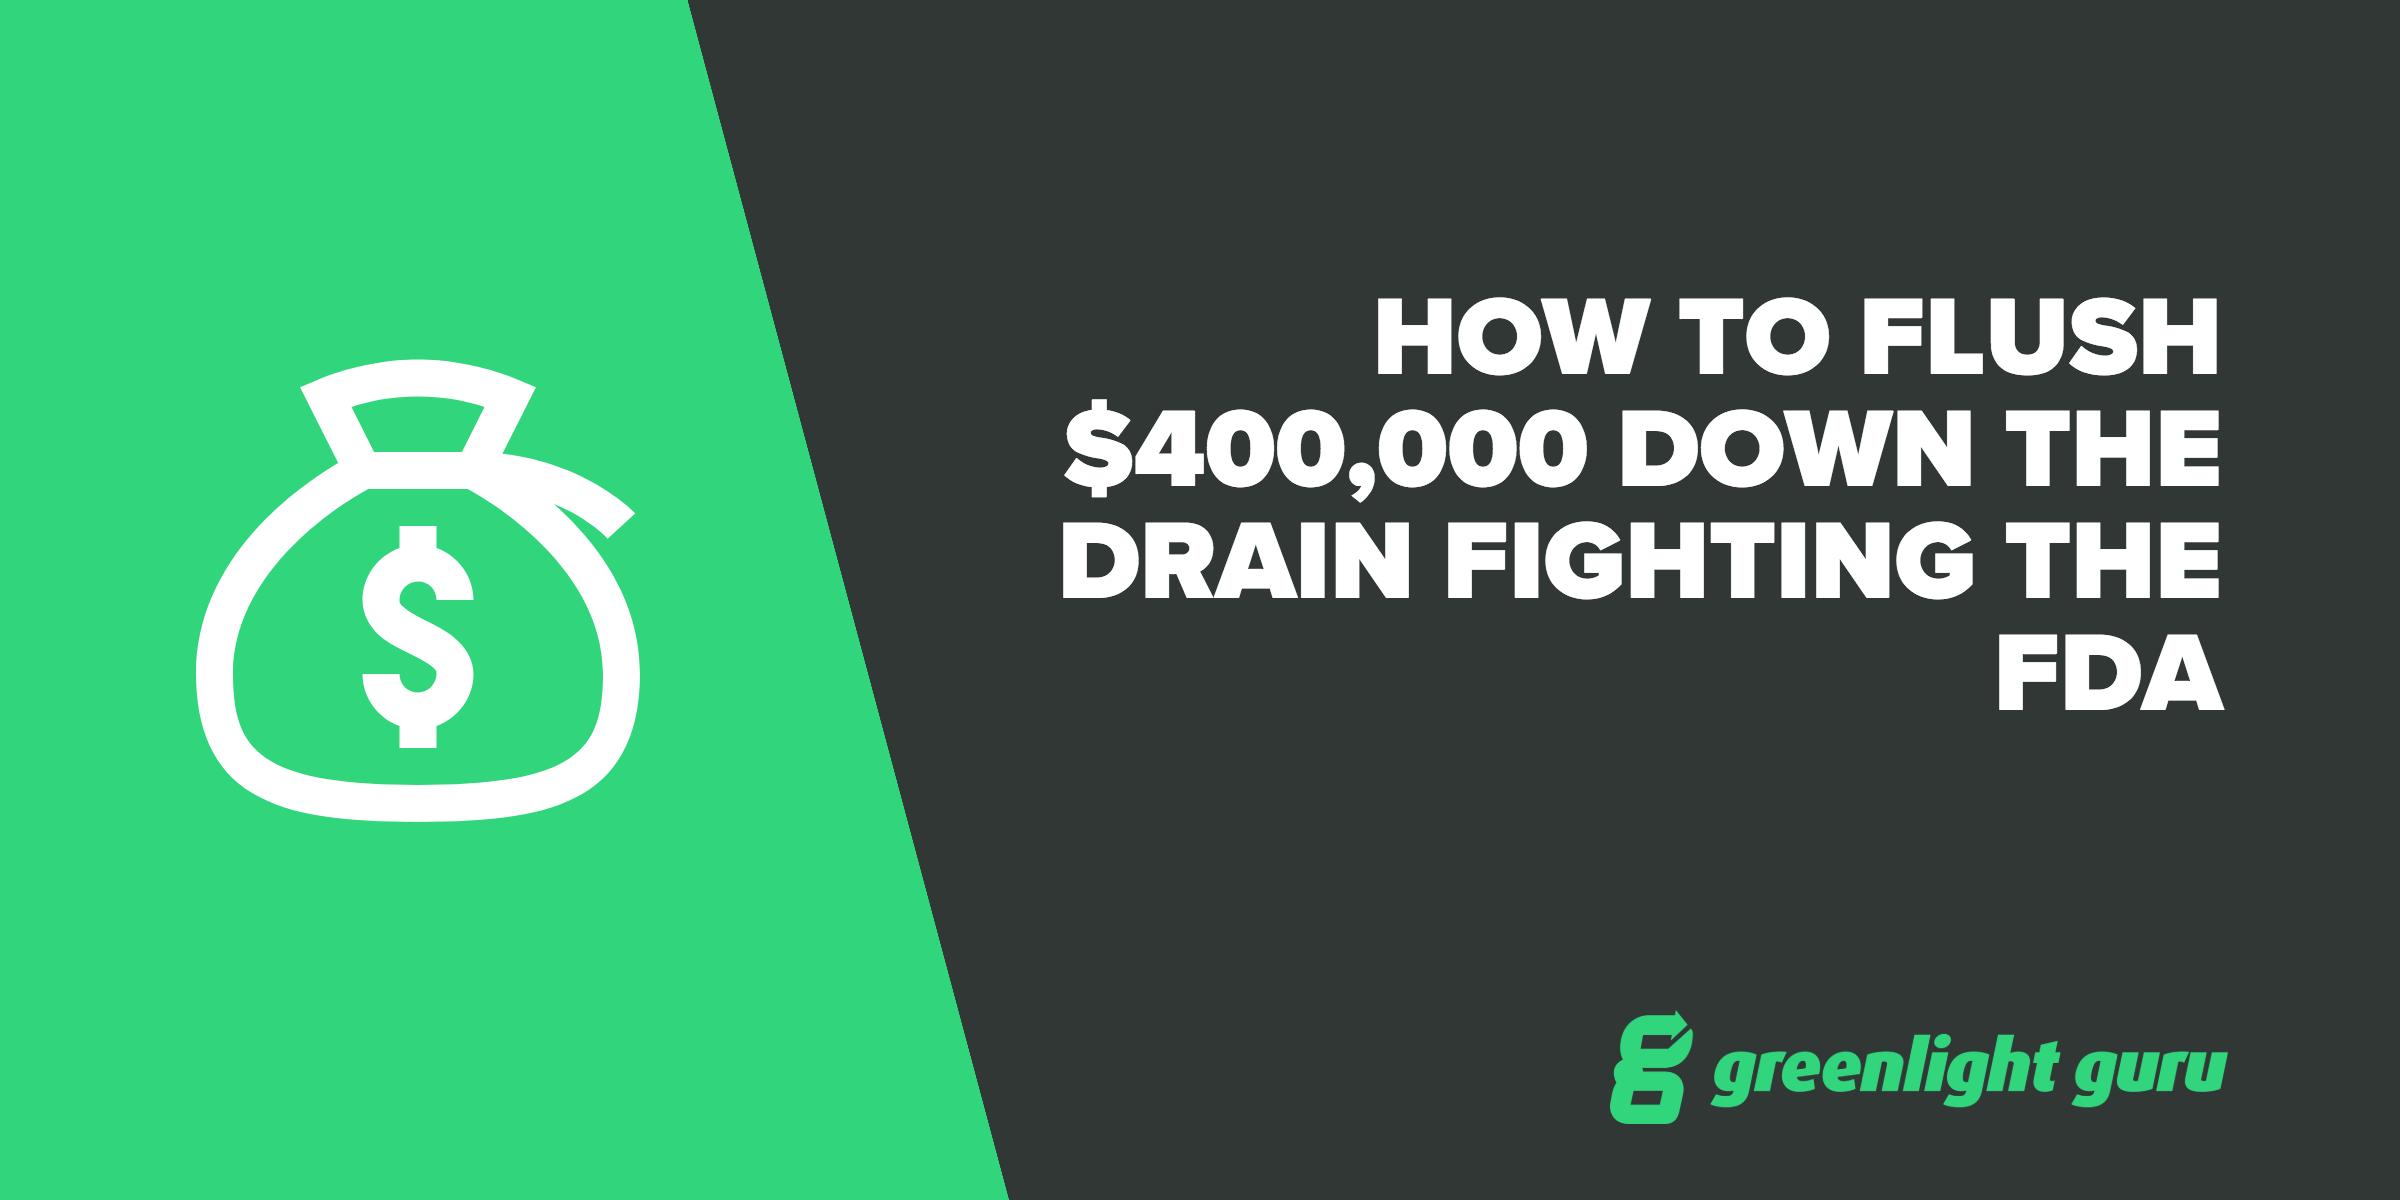 how-to-flush-400g-fighting-fda